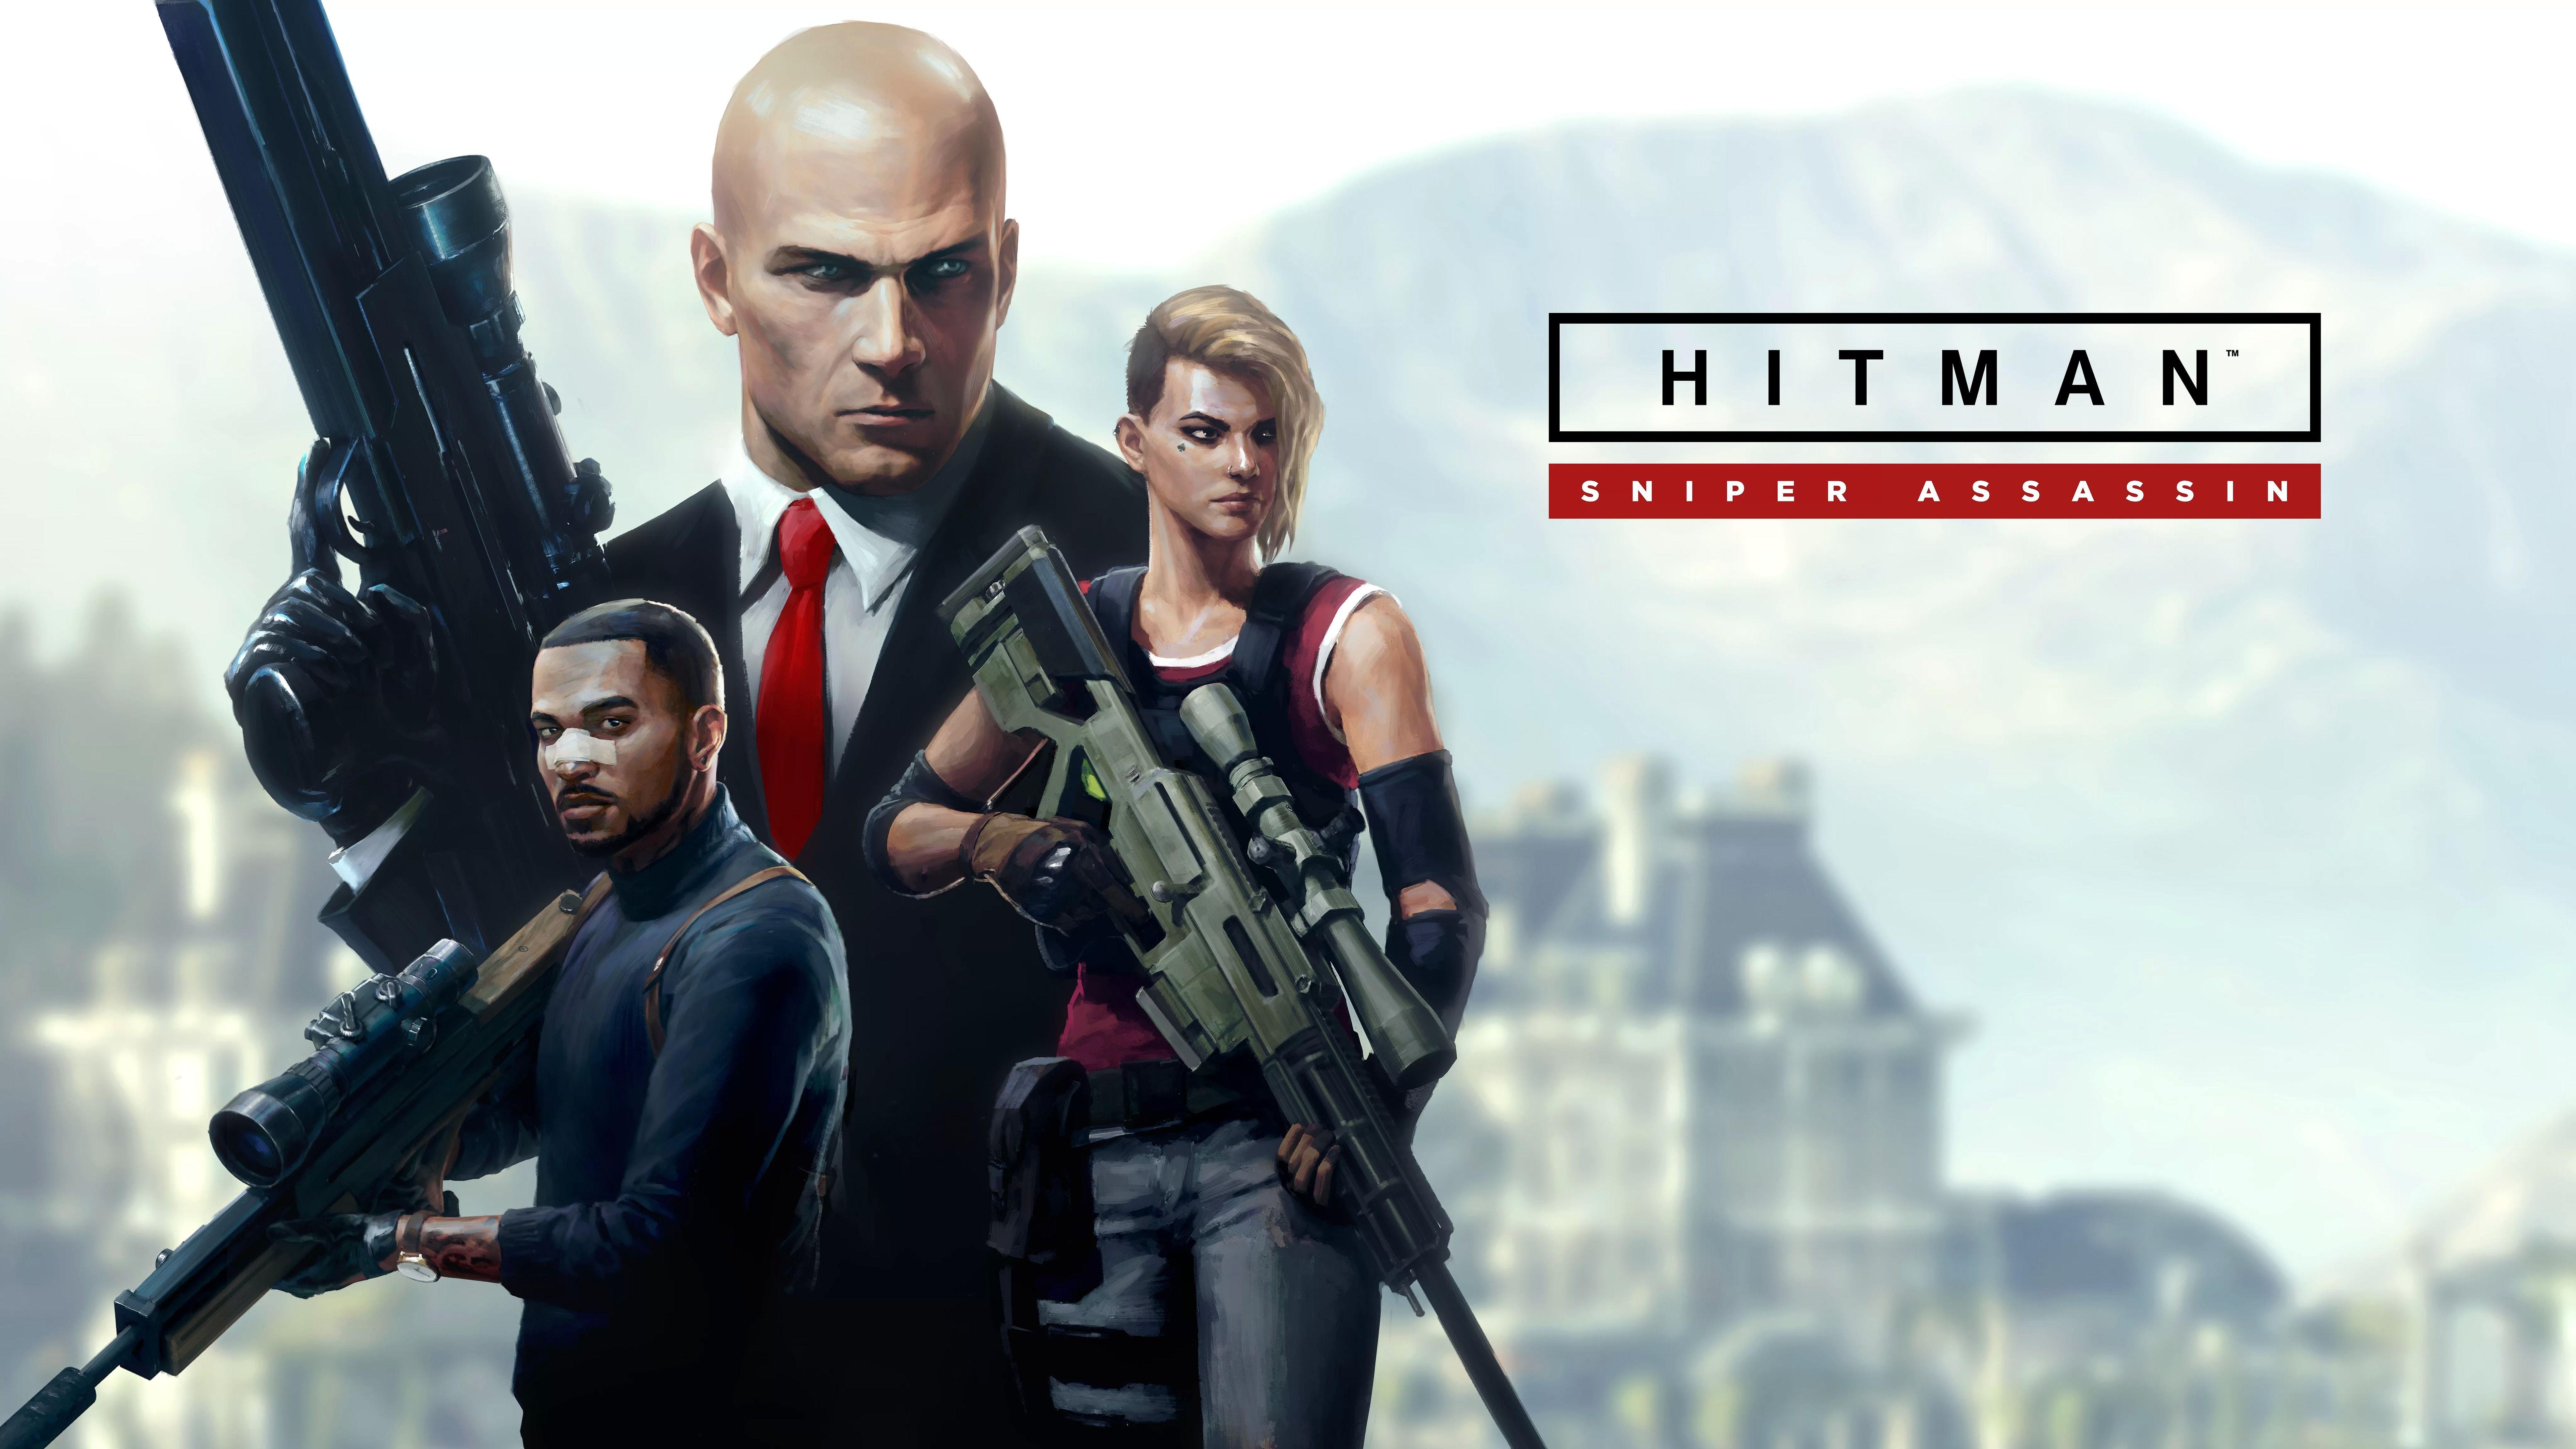 Hitman 2 Sniper Assassin 8k Games 2018 Games Wallpapers 4k